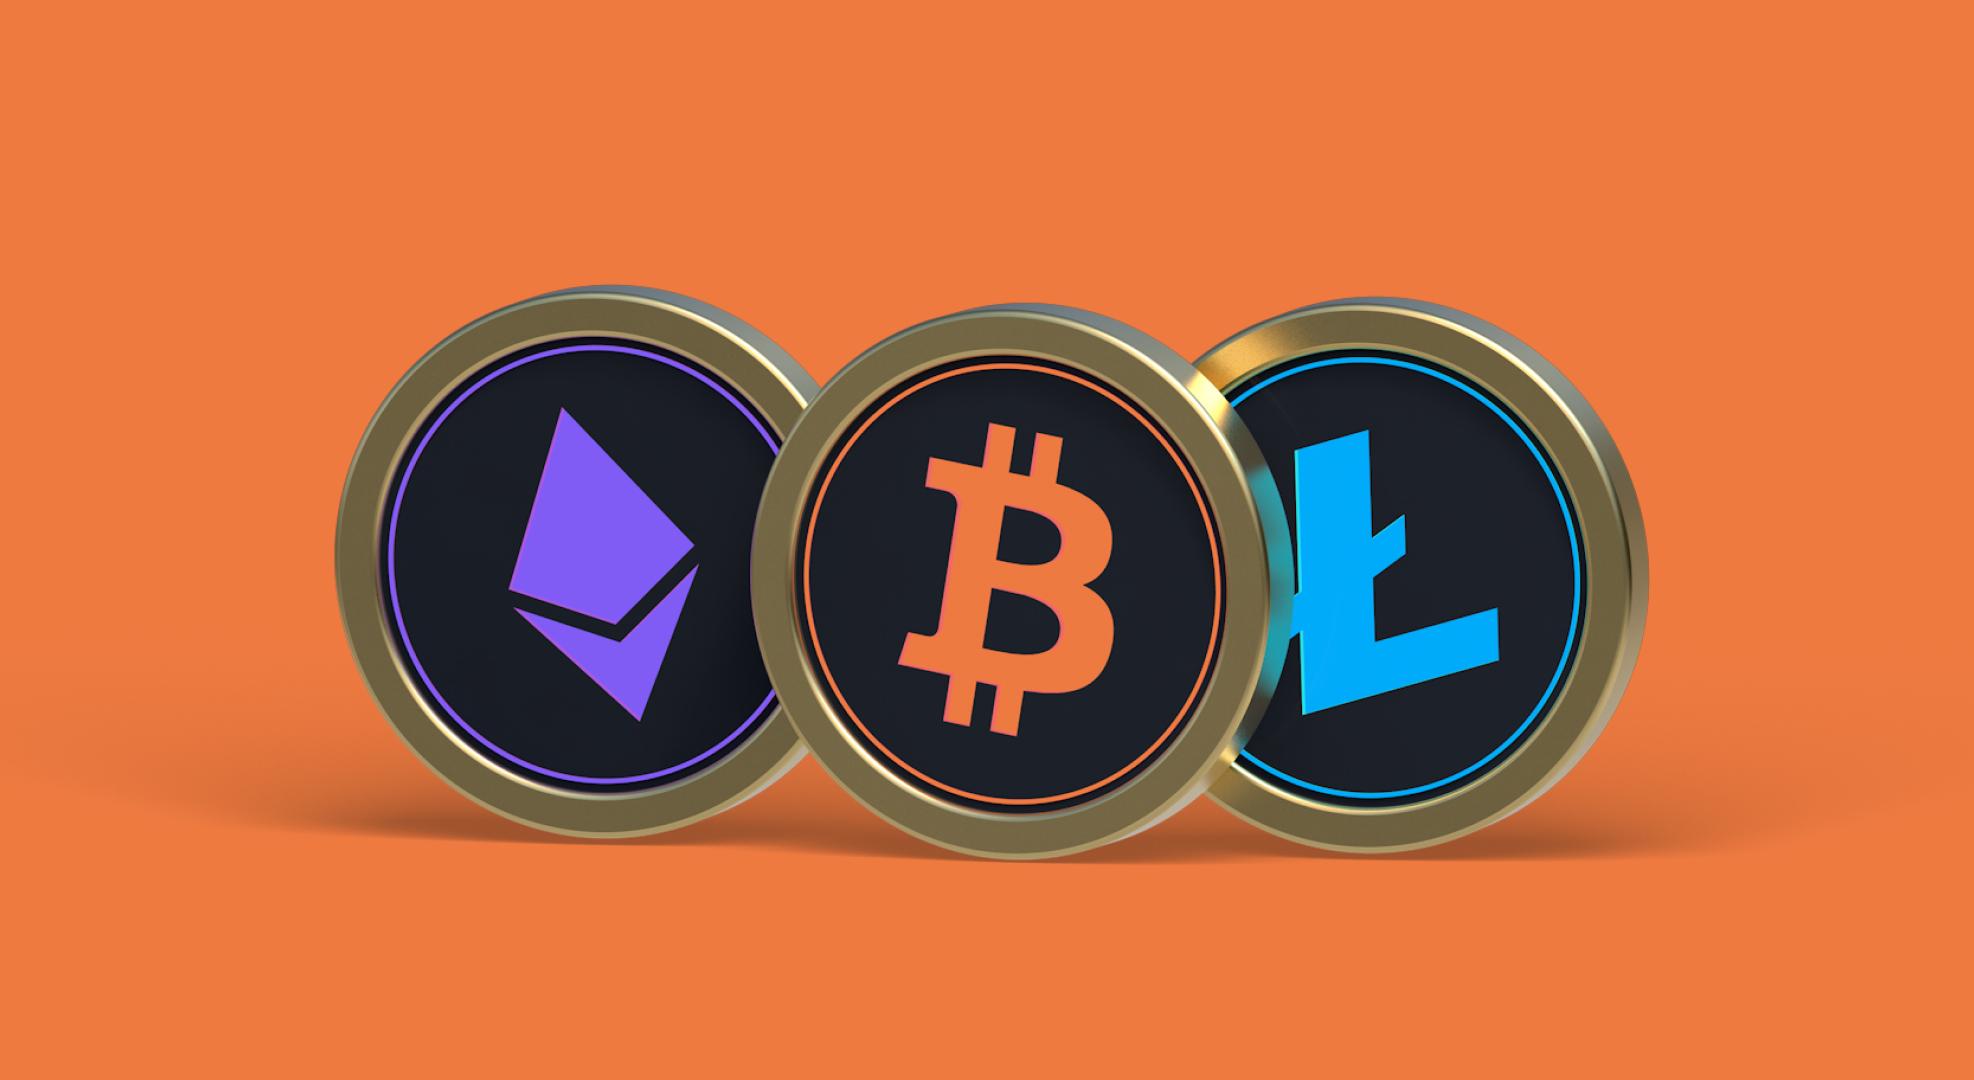 pirkti bitcoin brisbane